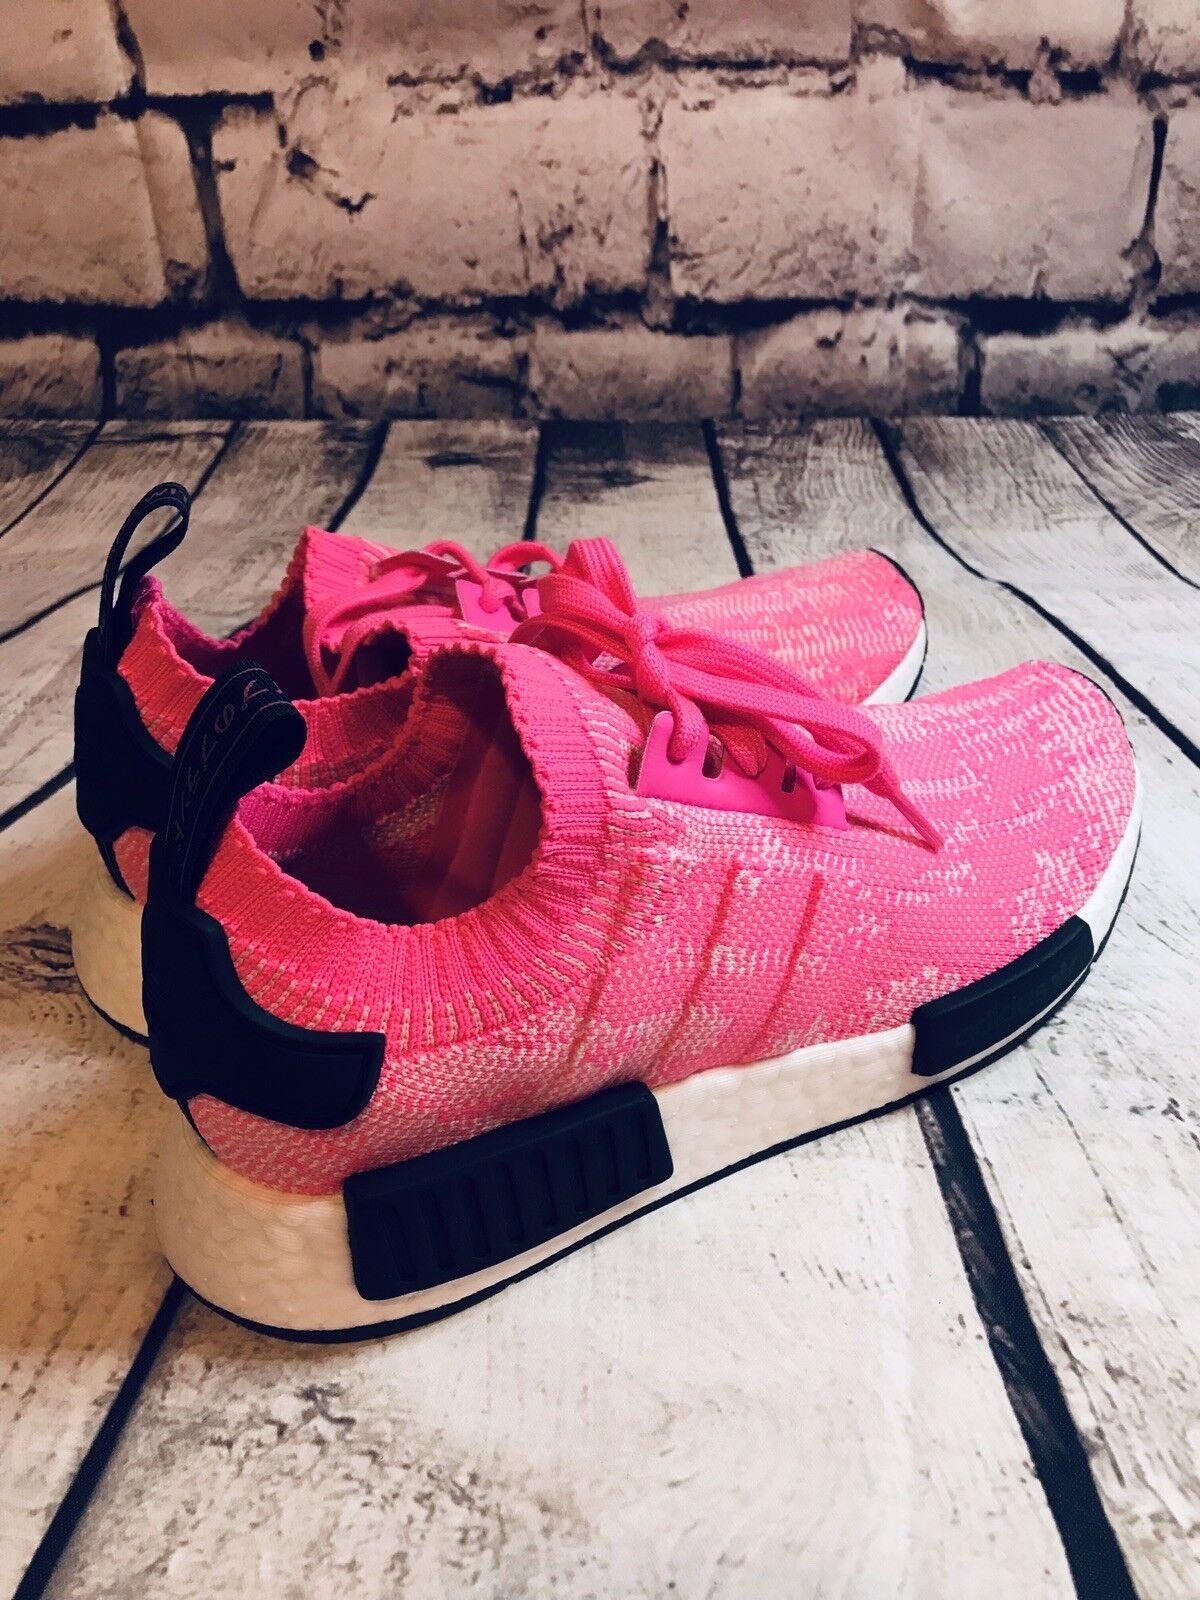 Adidas NMD R1 Solar pink Primeknit Women's Running shoes